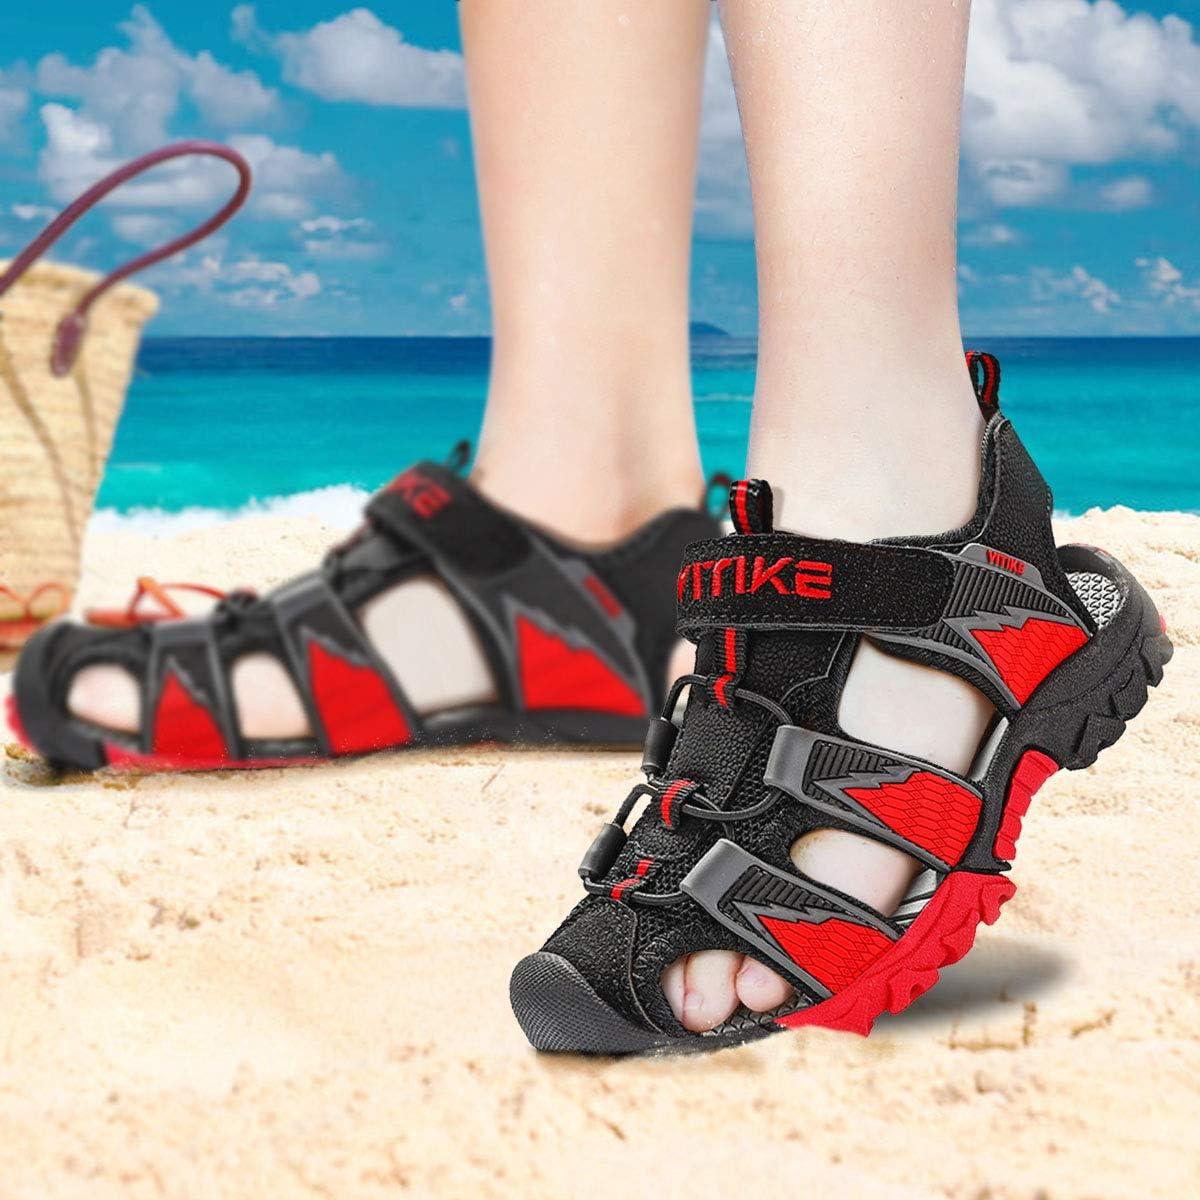 Sandalen Jungen Beach /& Pool Sneakers Somme Strandschuhe Trekking-/& Wanderschuhe Unisex-Kinder